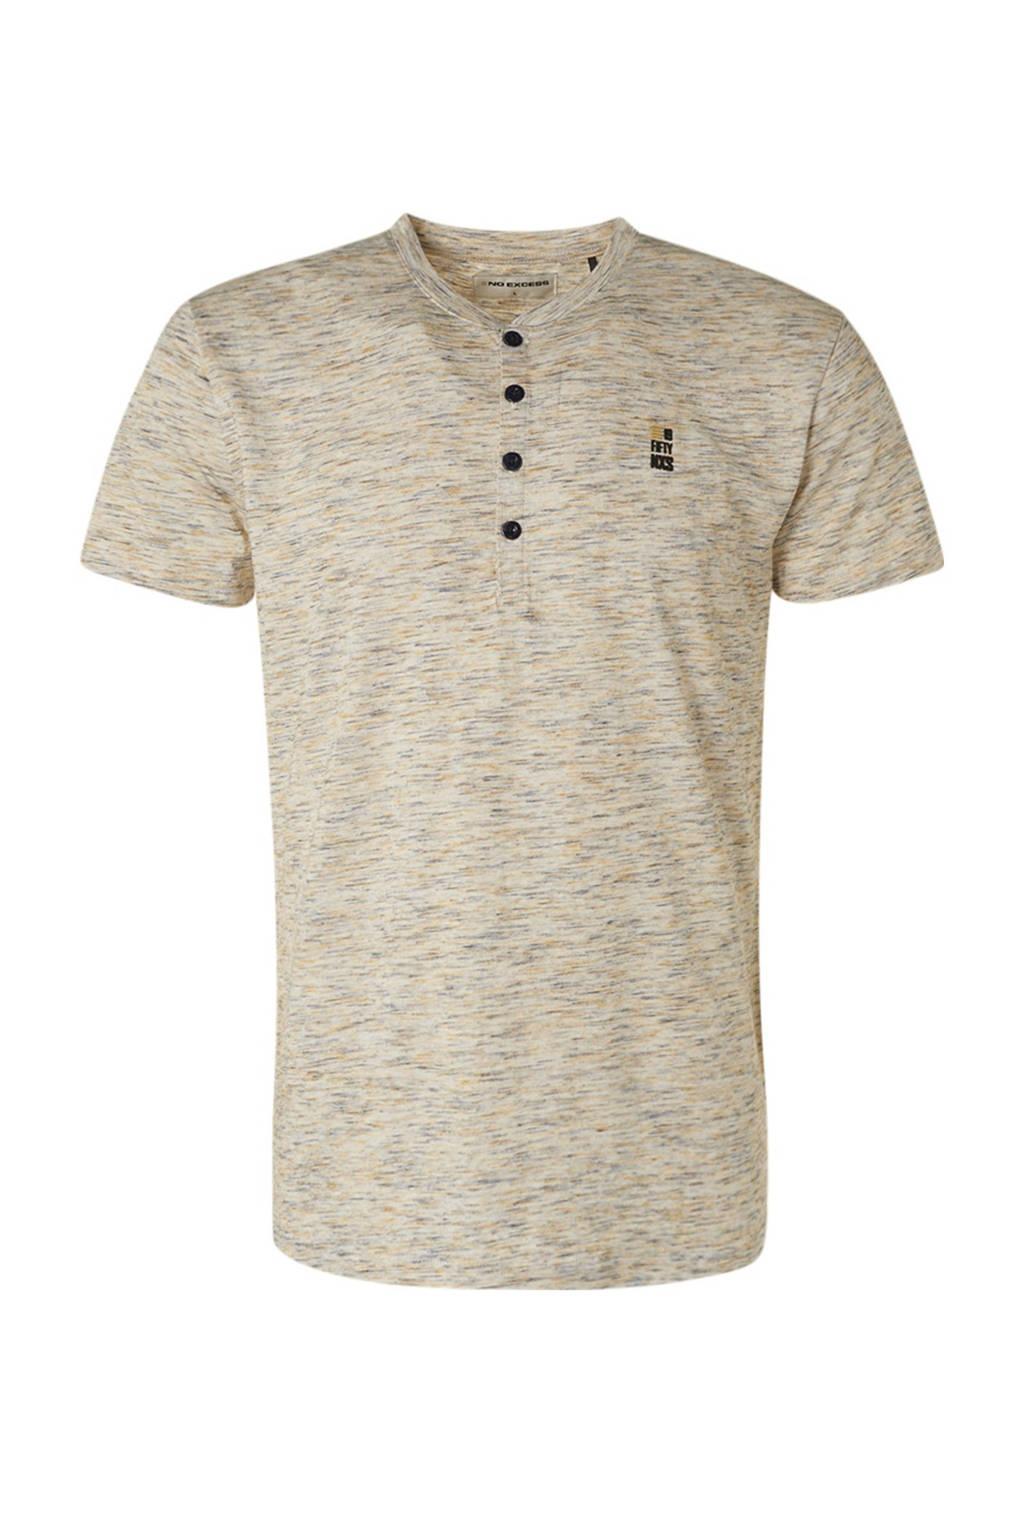 No Excess gemêleerd T-shirt beige, Beige